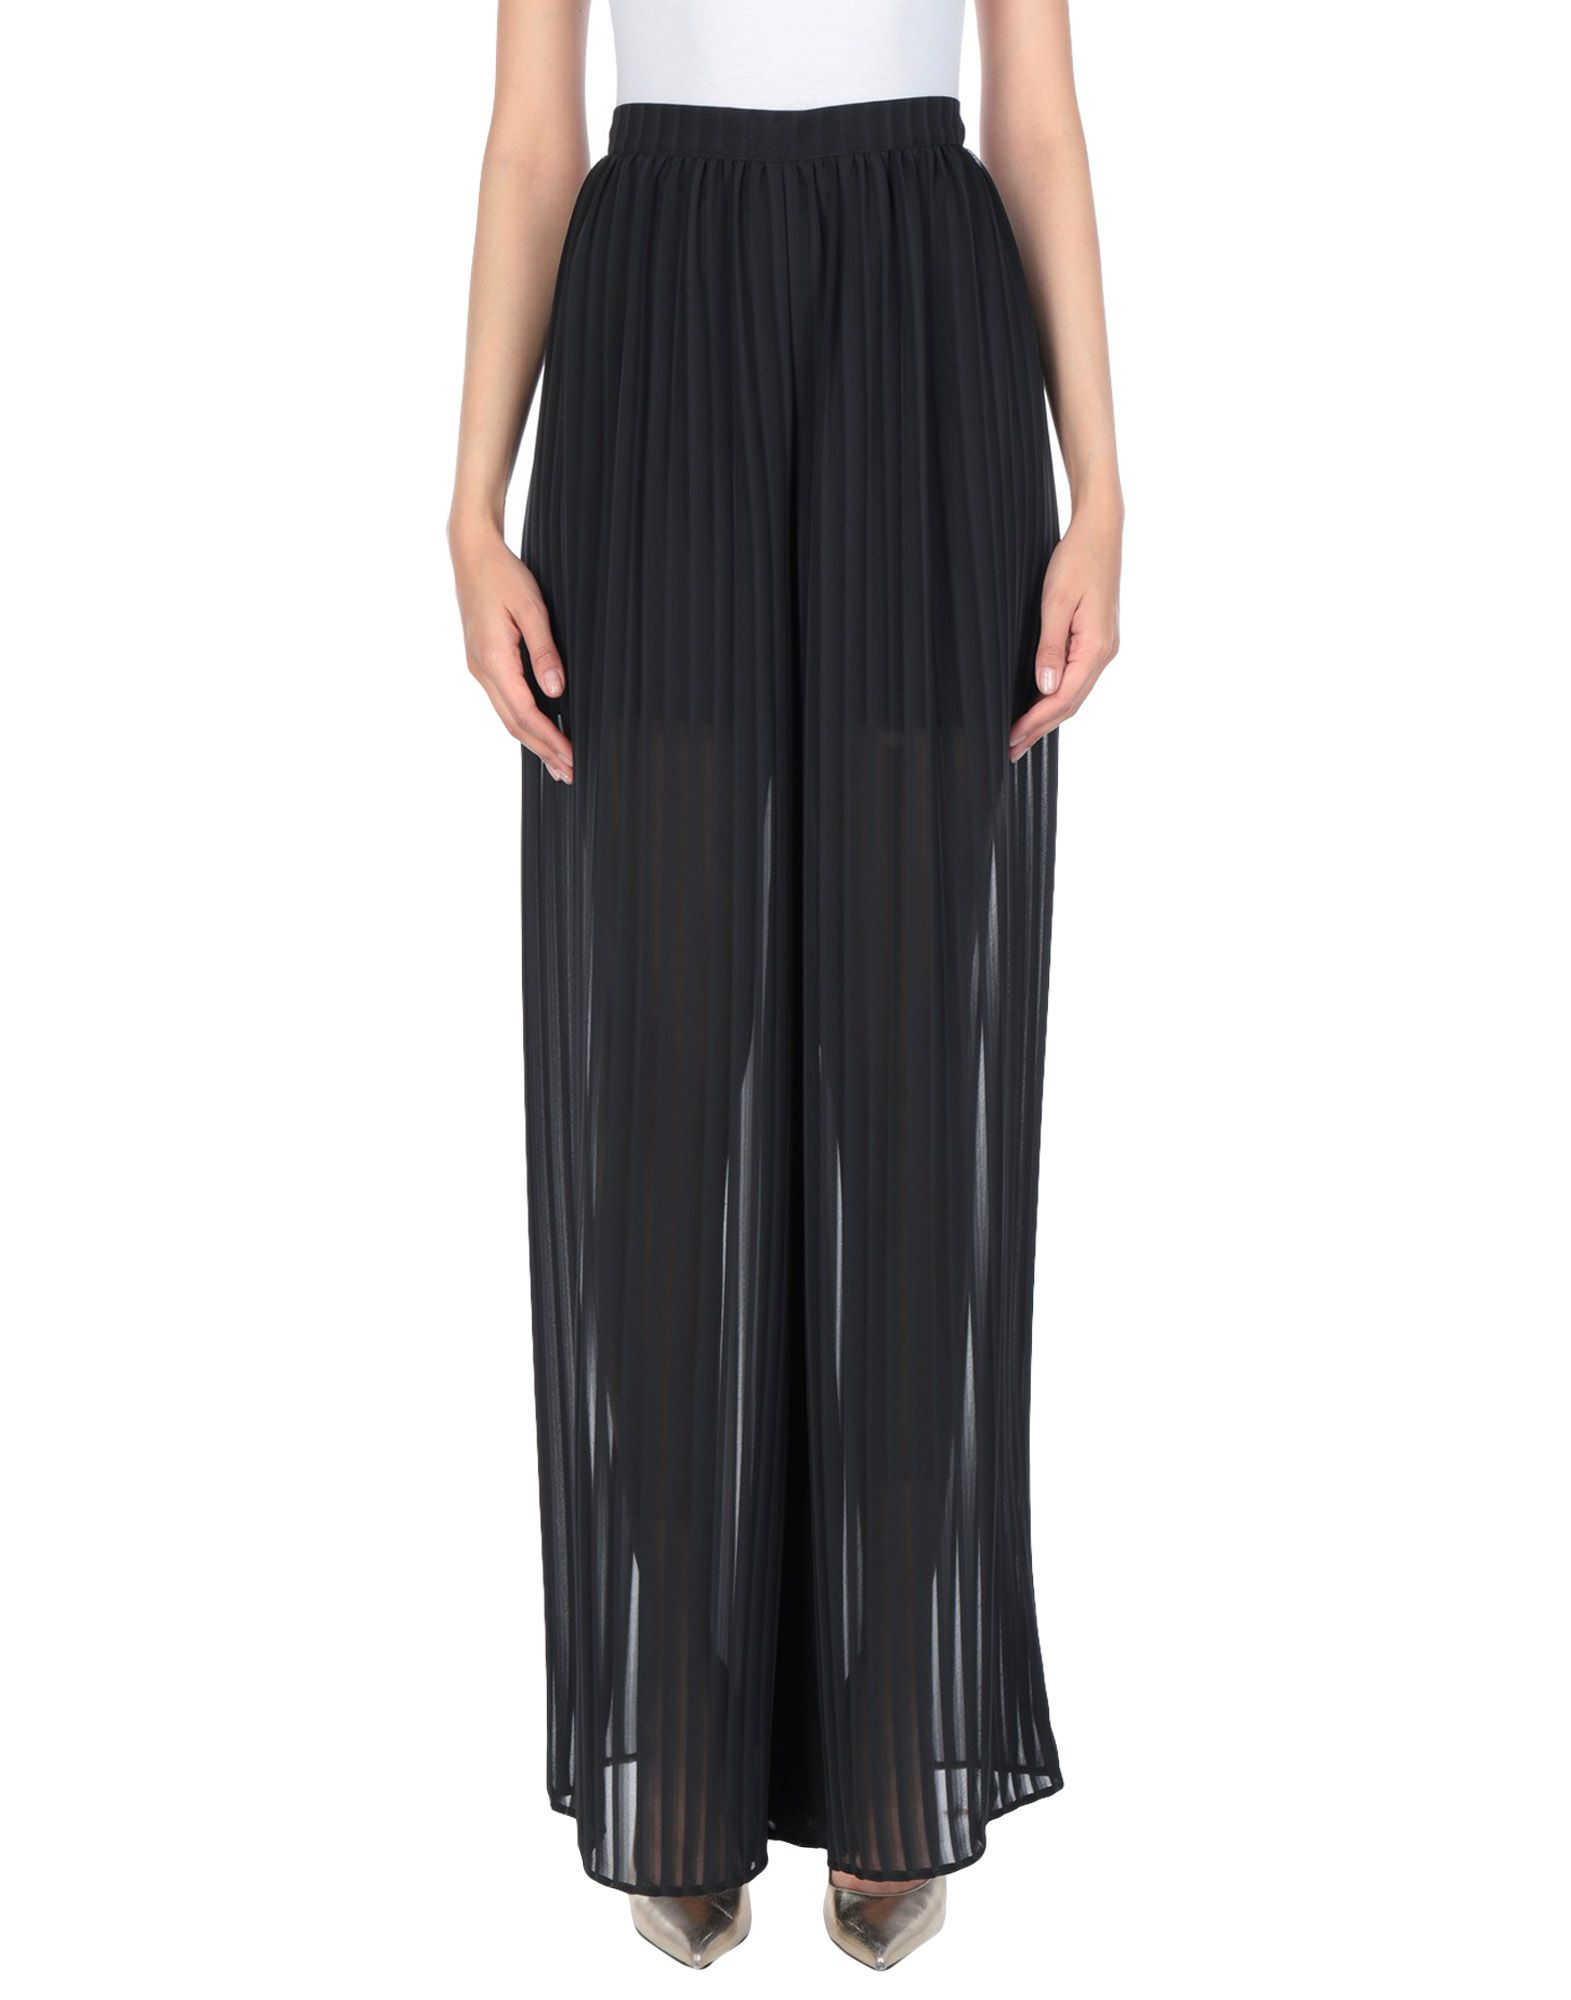 Pantalone Francesca & Veronica Feleppa donna donna donna - 13347863EP 0ec